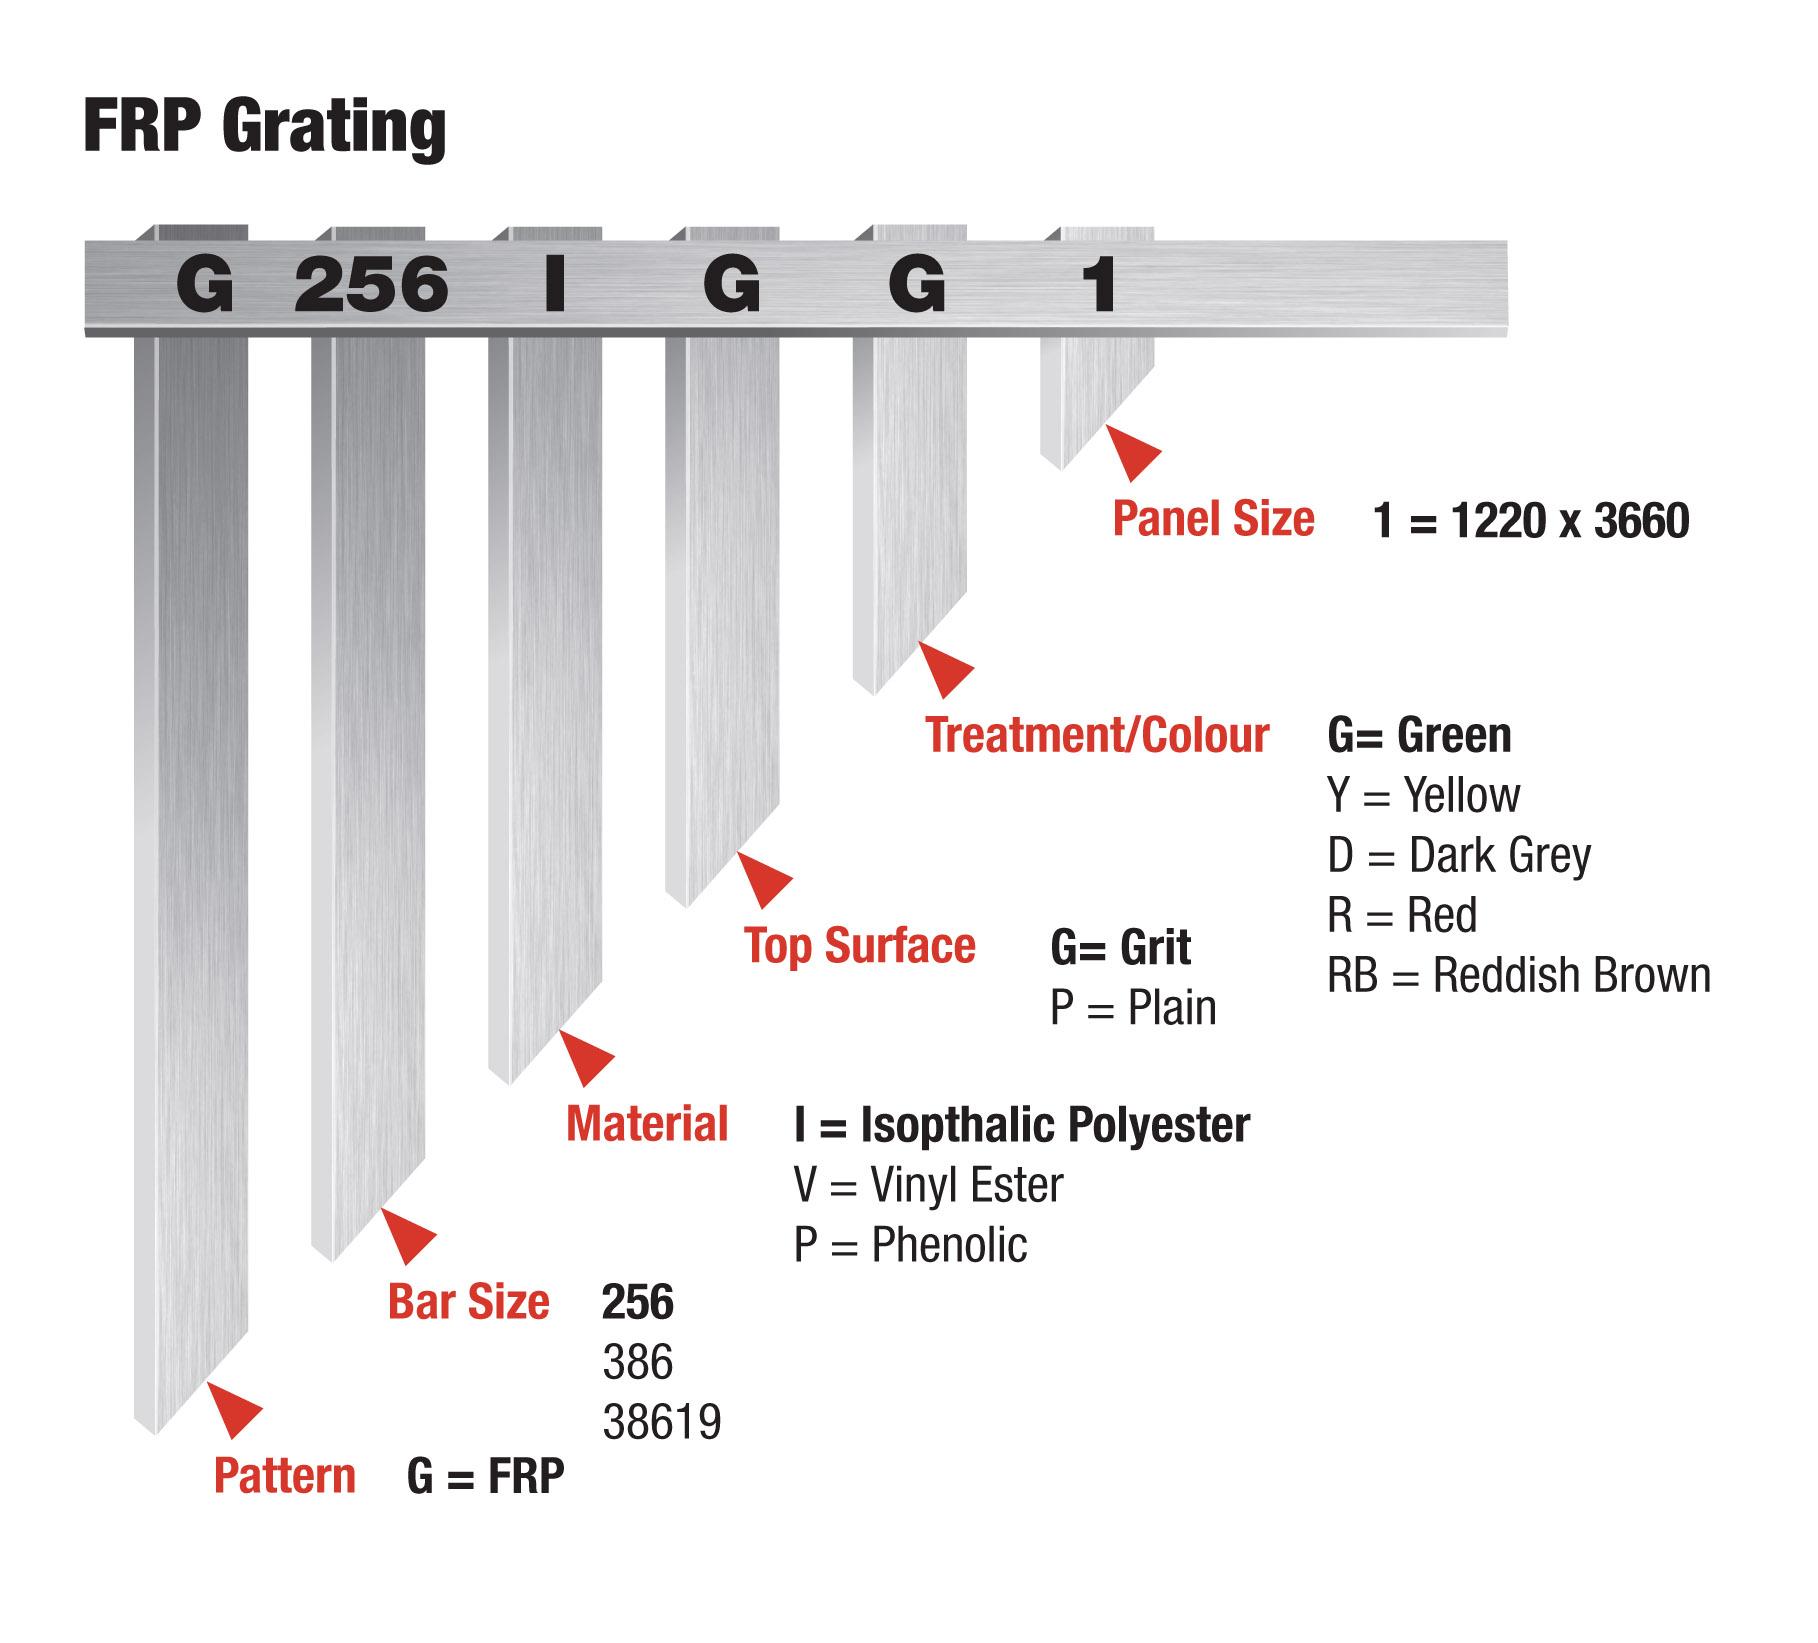 FRP GRATING part number protocols